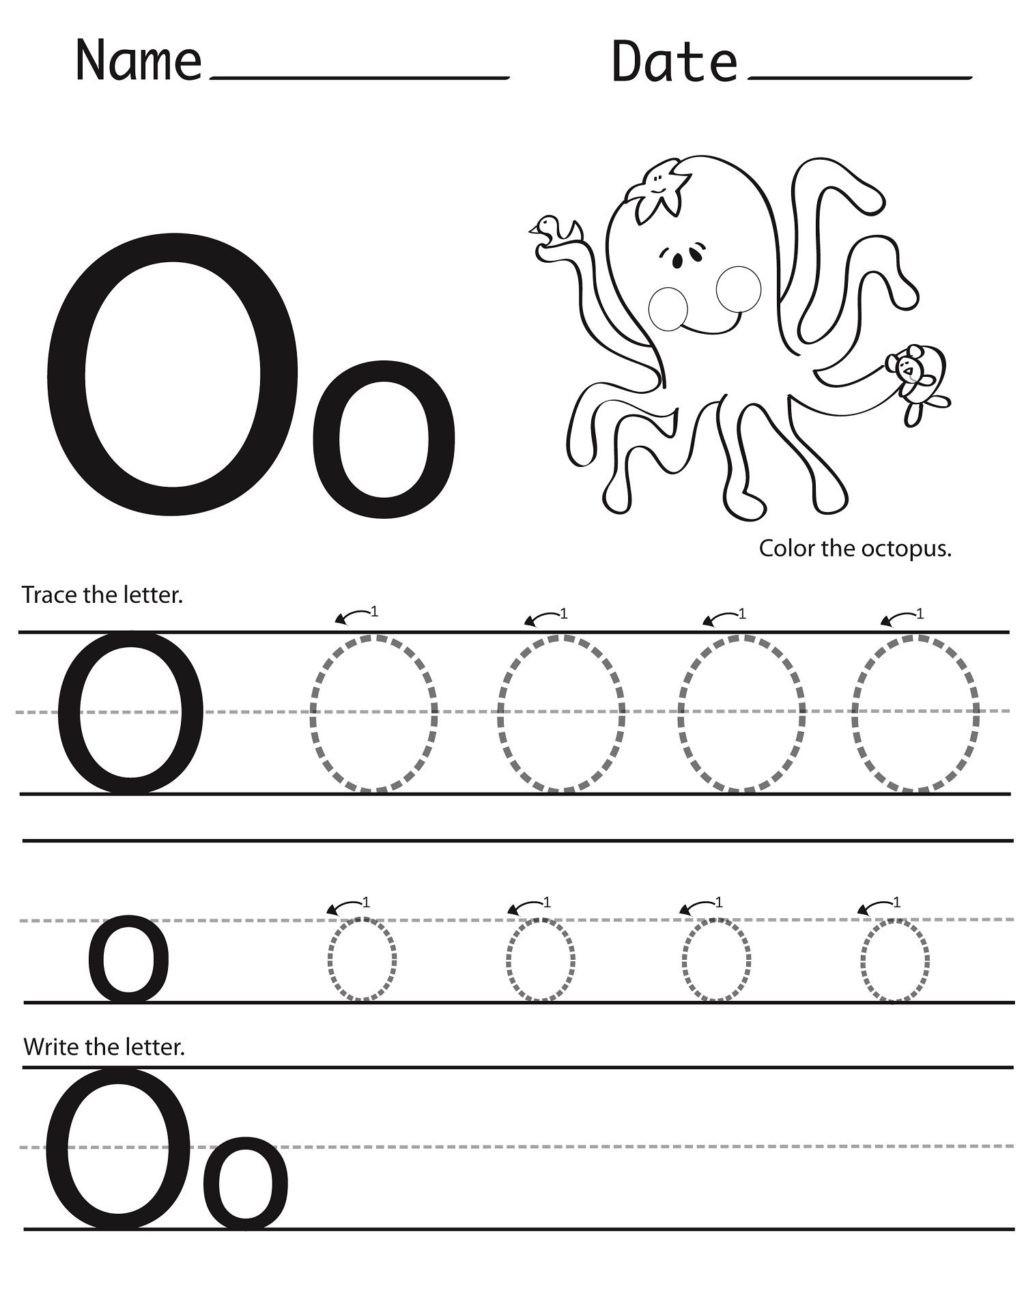 Letter O Worksheet for Kindergarten Worksheet Worksheet O Worksheets for Kindergarten Long